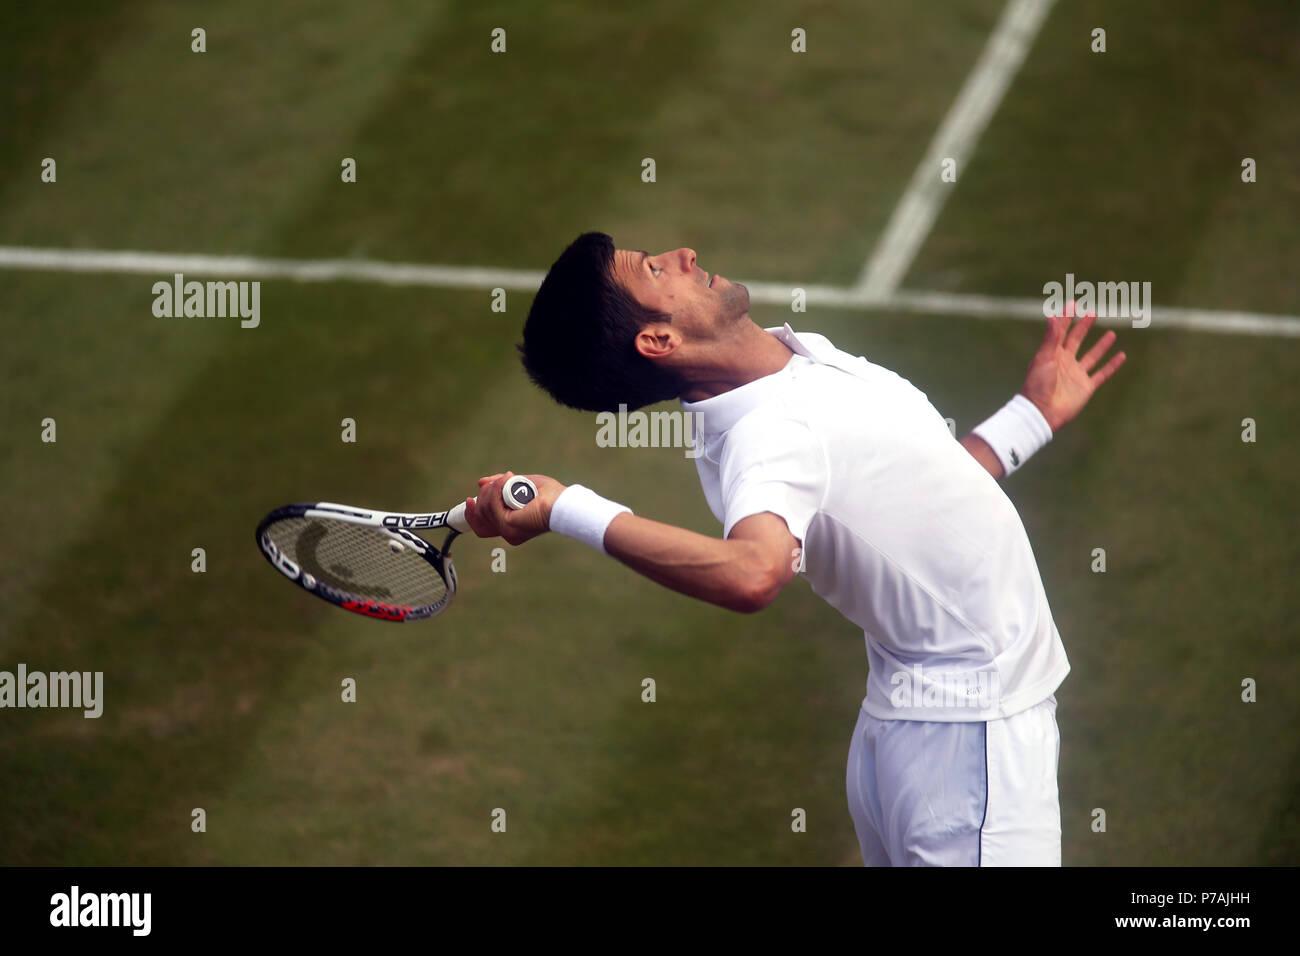 London, England - July 5, 2018.  Wimbledon Tennis:  Novak Djokovic of Serbia serving during his second round victory over Horacio Zeballos of Argentina today at Wimbledon Credit: Adam Stoltman/Alamy Live News - Stock Image